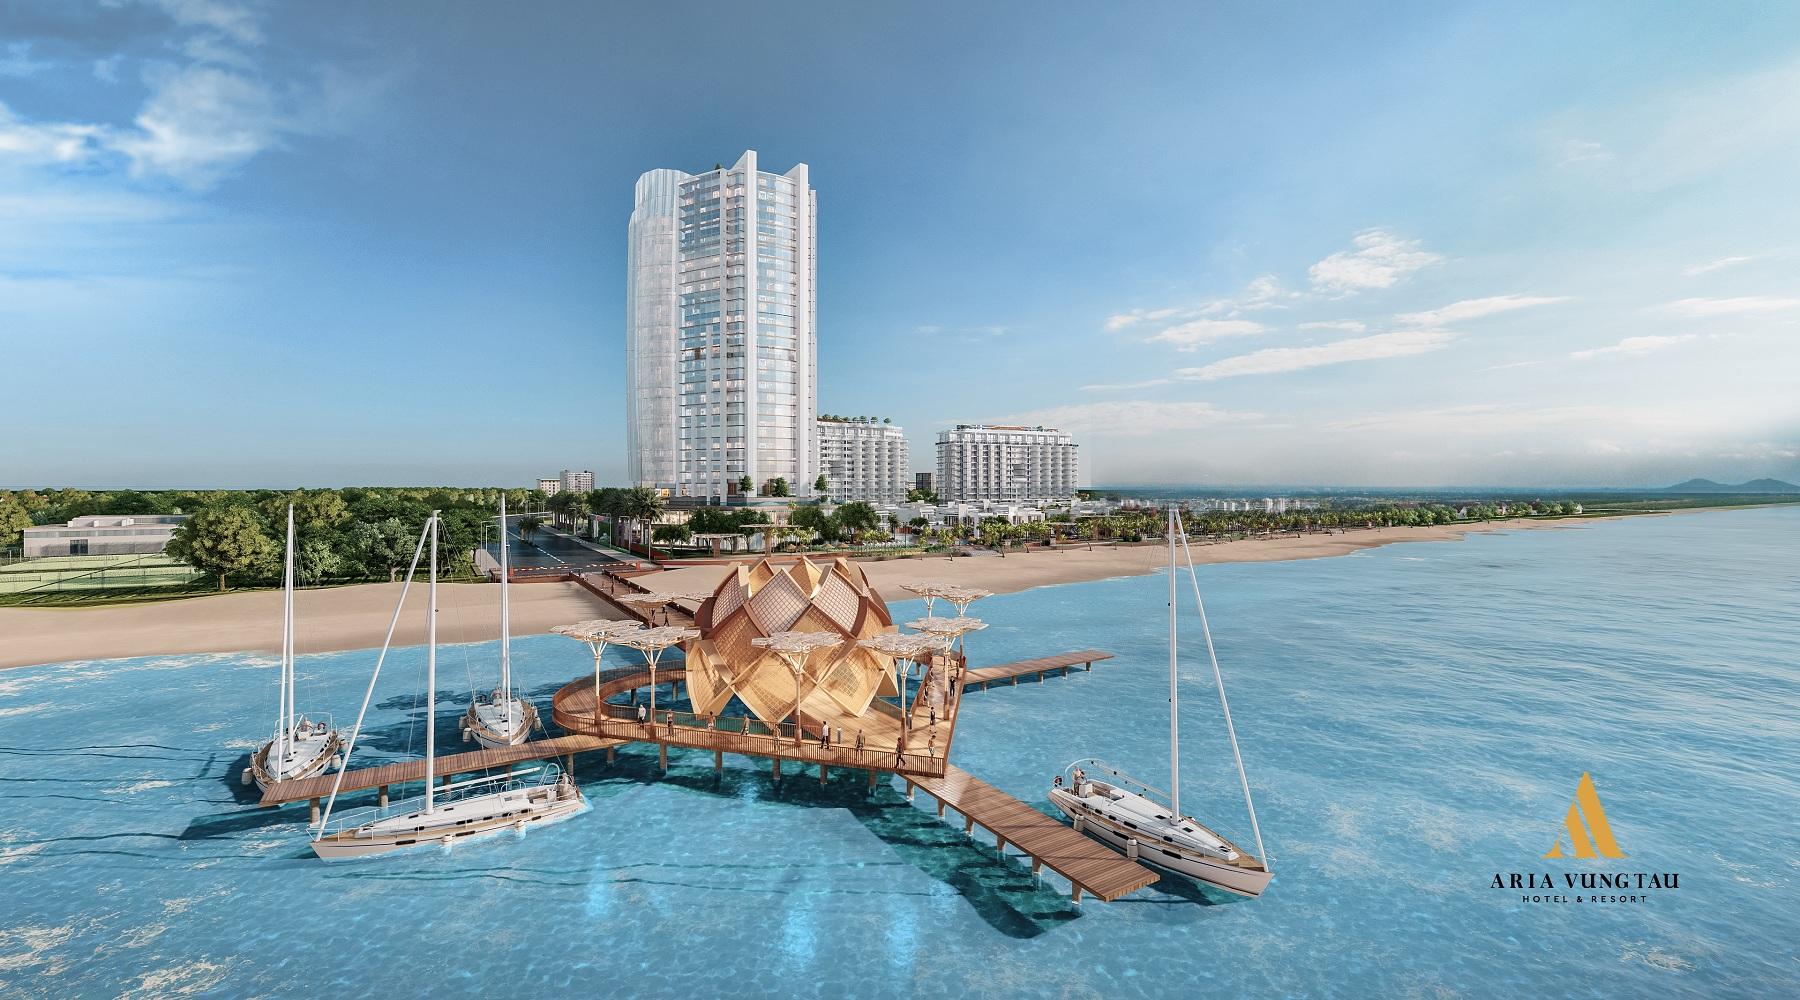 https://charmington.org/public/upload/aria-vung-tau-hotel-resort-5-1576246341.jpg